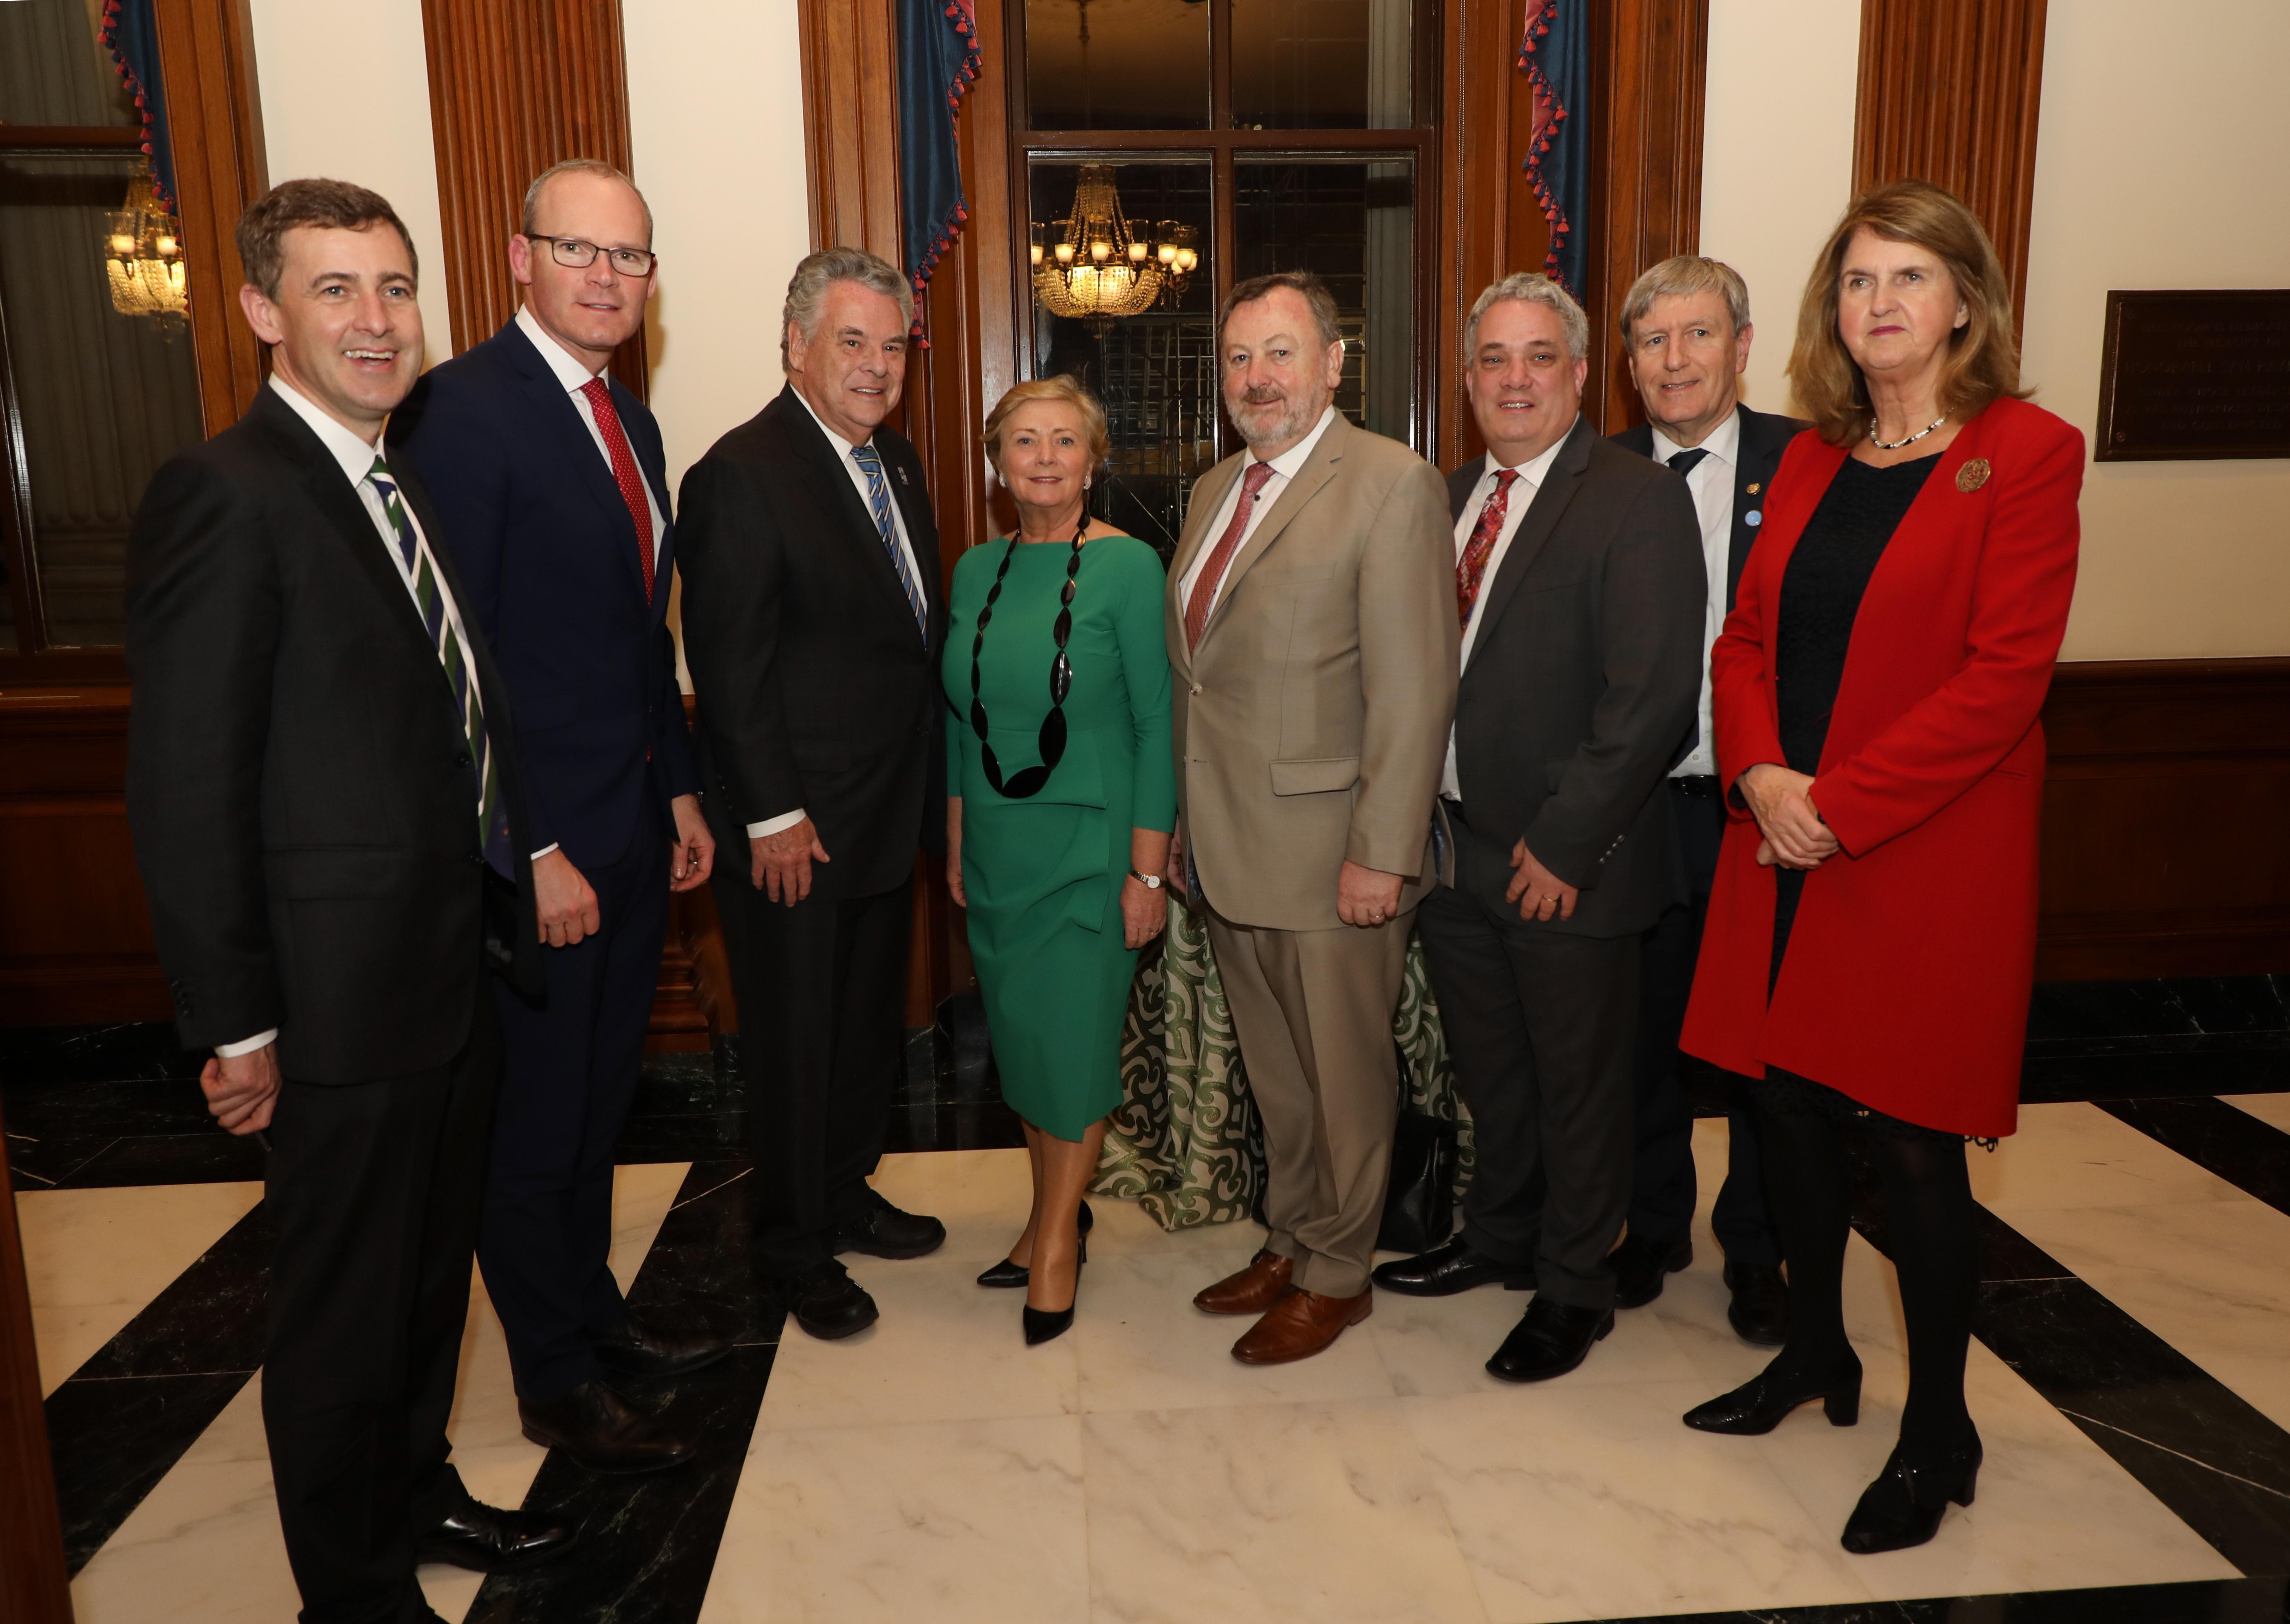 Oireachtas and Congress strengthen ties | News & Views